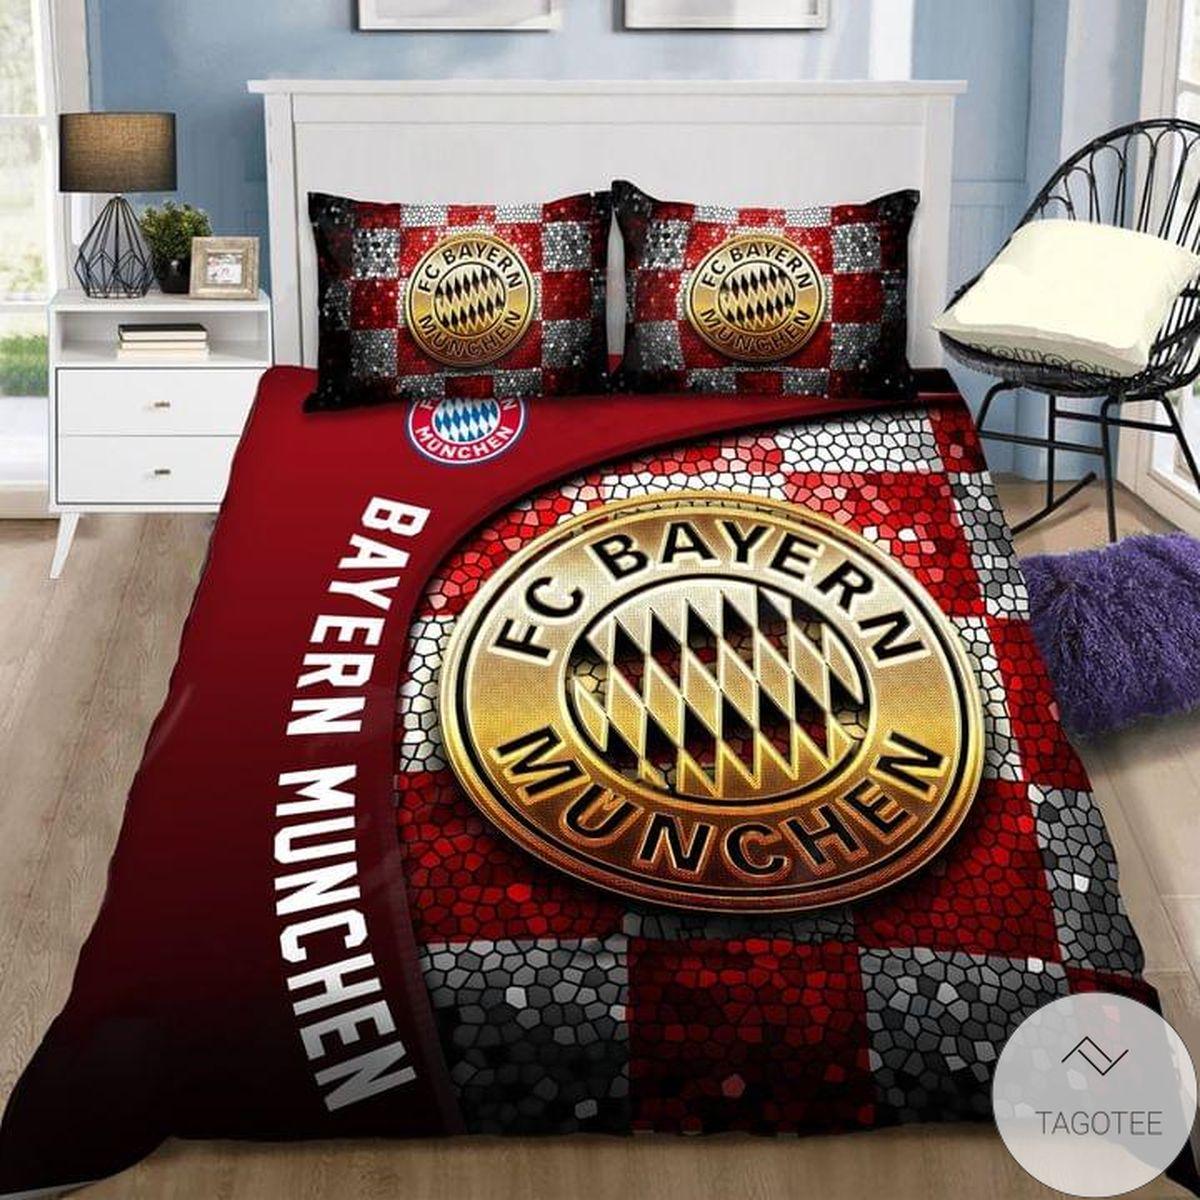 Fc Bayern Munich Bedding Set